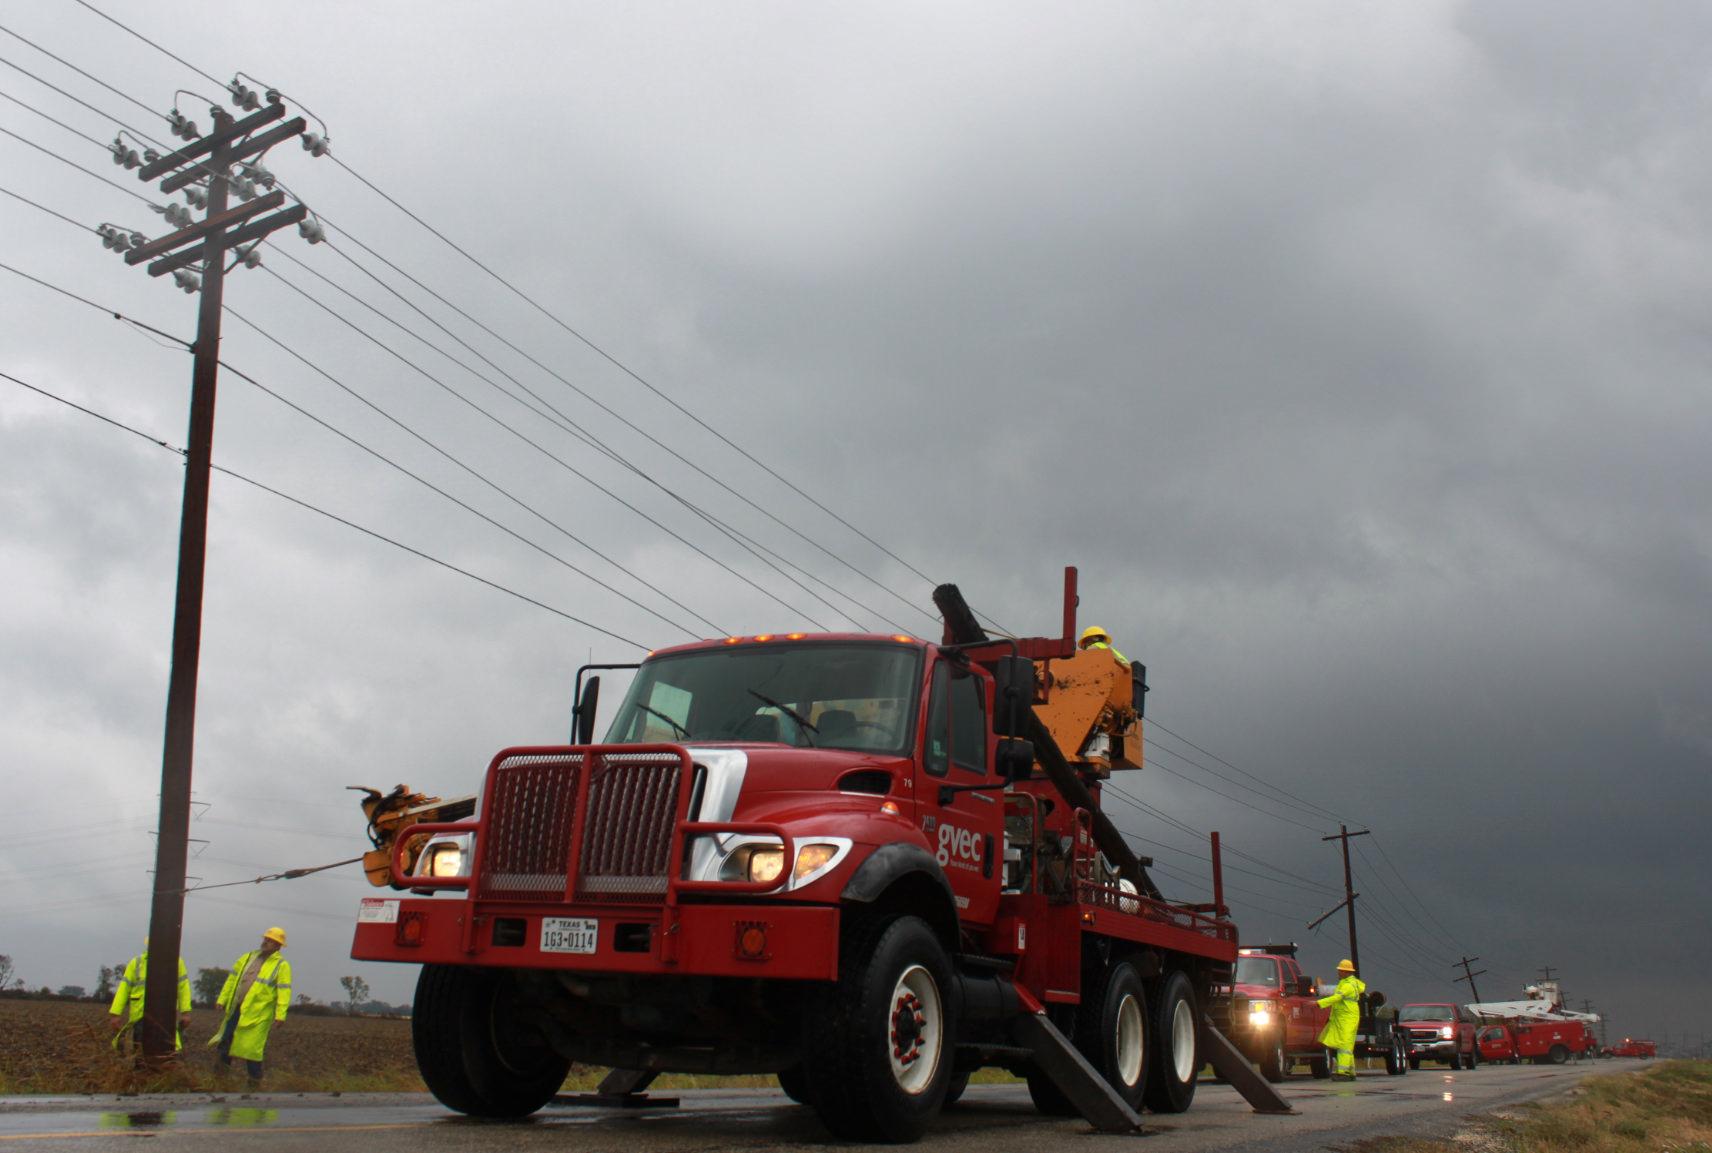 Big truck with lineman repairing lines